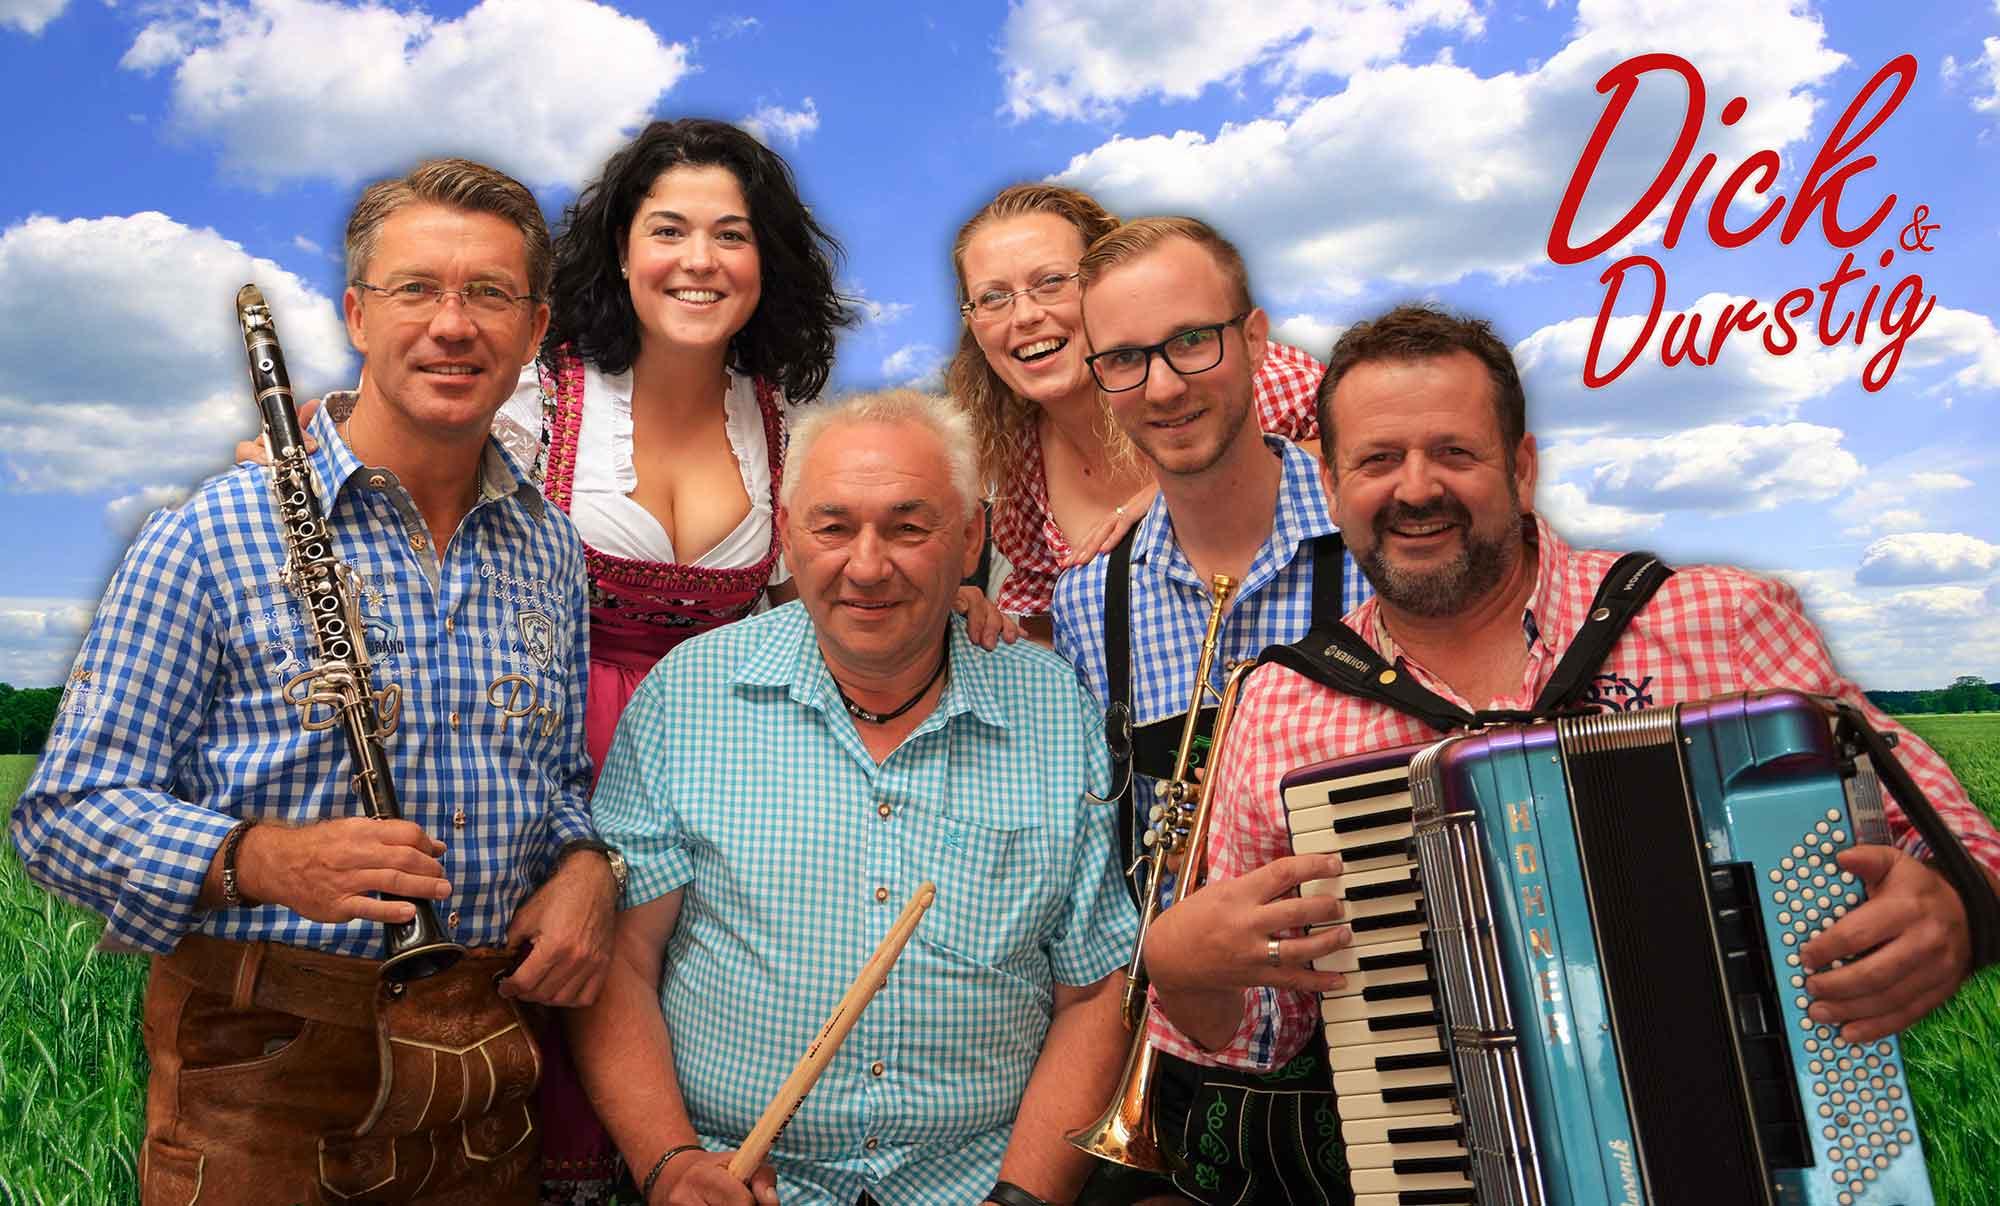 Dick & Durstig rocken am Eröffungs-Donnerstag das Festzelt – Eintritt frei!